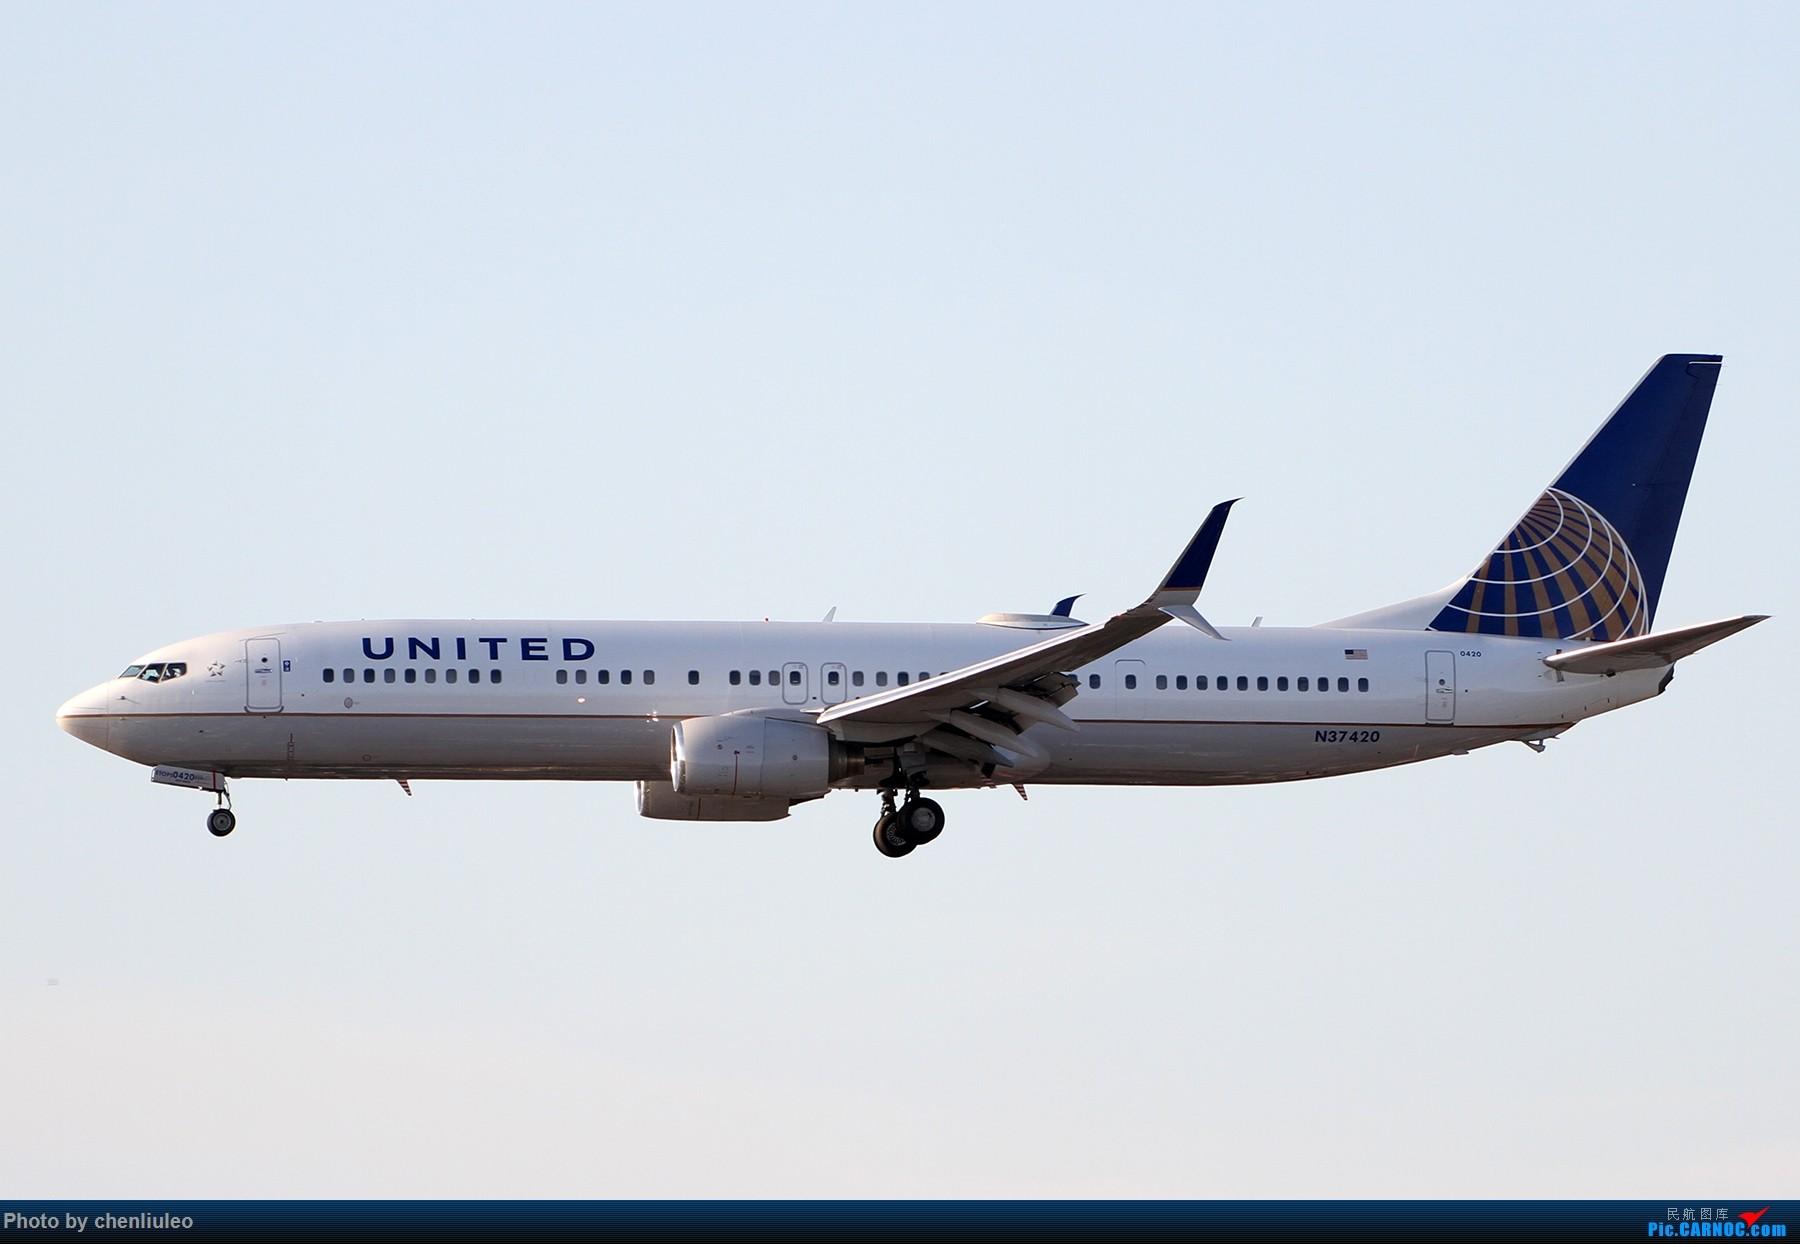 Re:[原创]【北美飞友会】洛杉矶世界机场黄昏随拍 BOEING 737-900ER N37420 美国洛杉矶机场